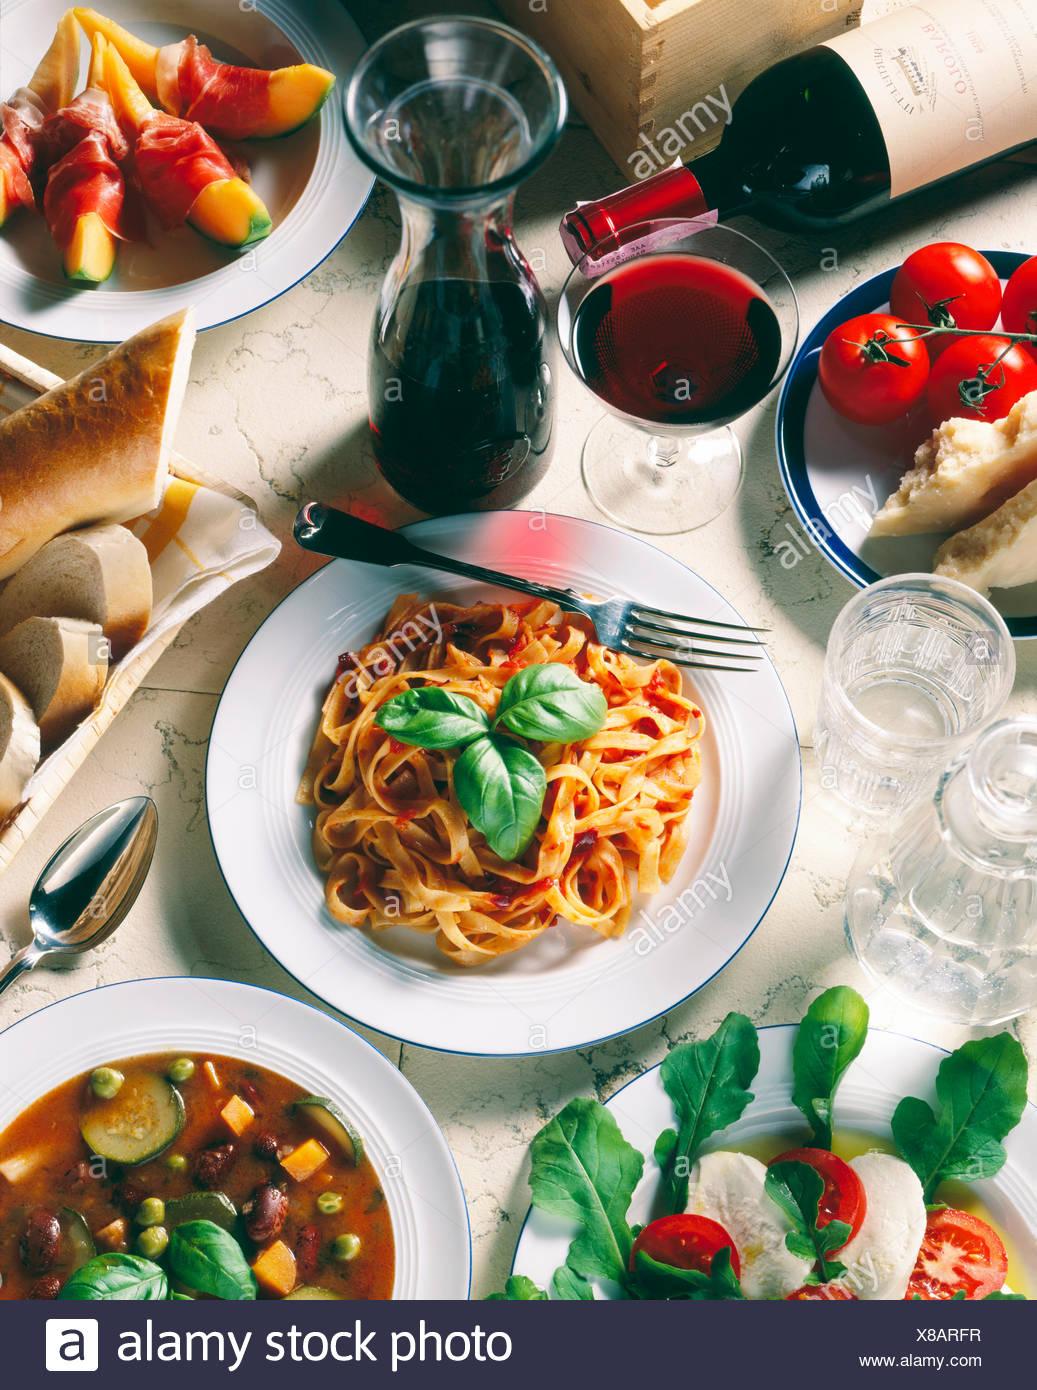 Italian national cuisine, Tagliatelle with tomato sauce, Parmesan cheese, mozzarella cheese, minestrone soup - Stock Image